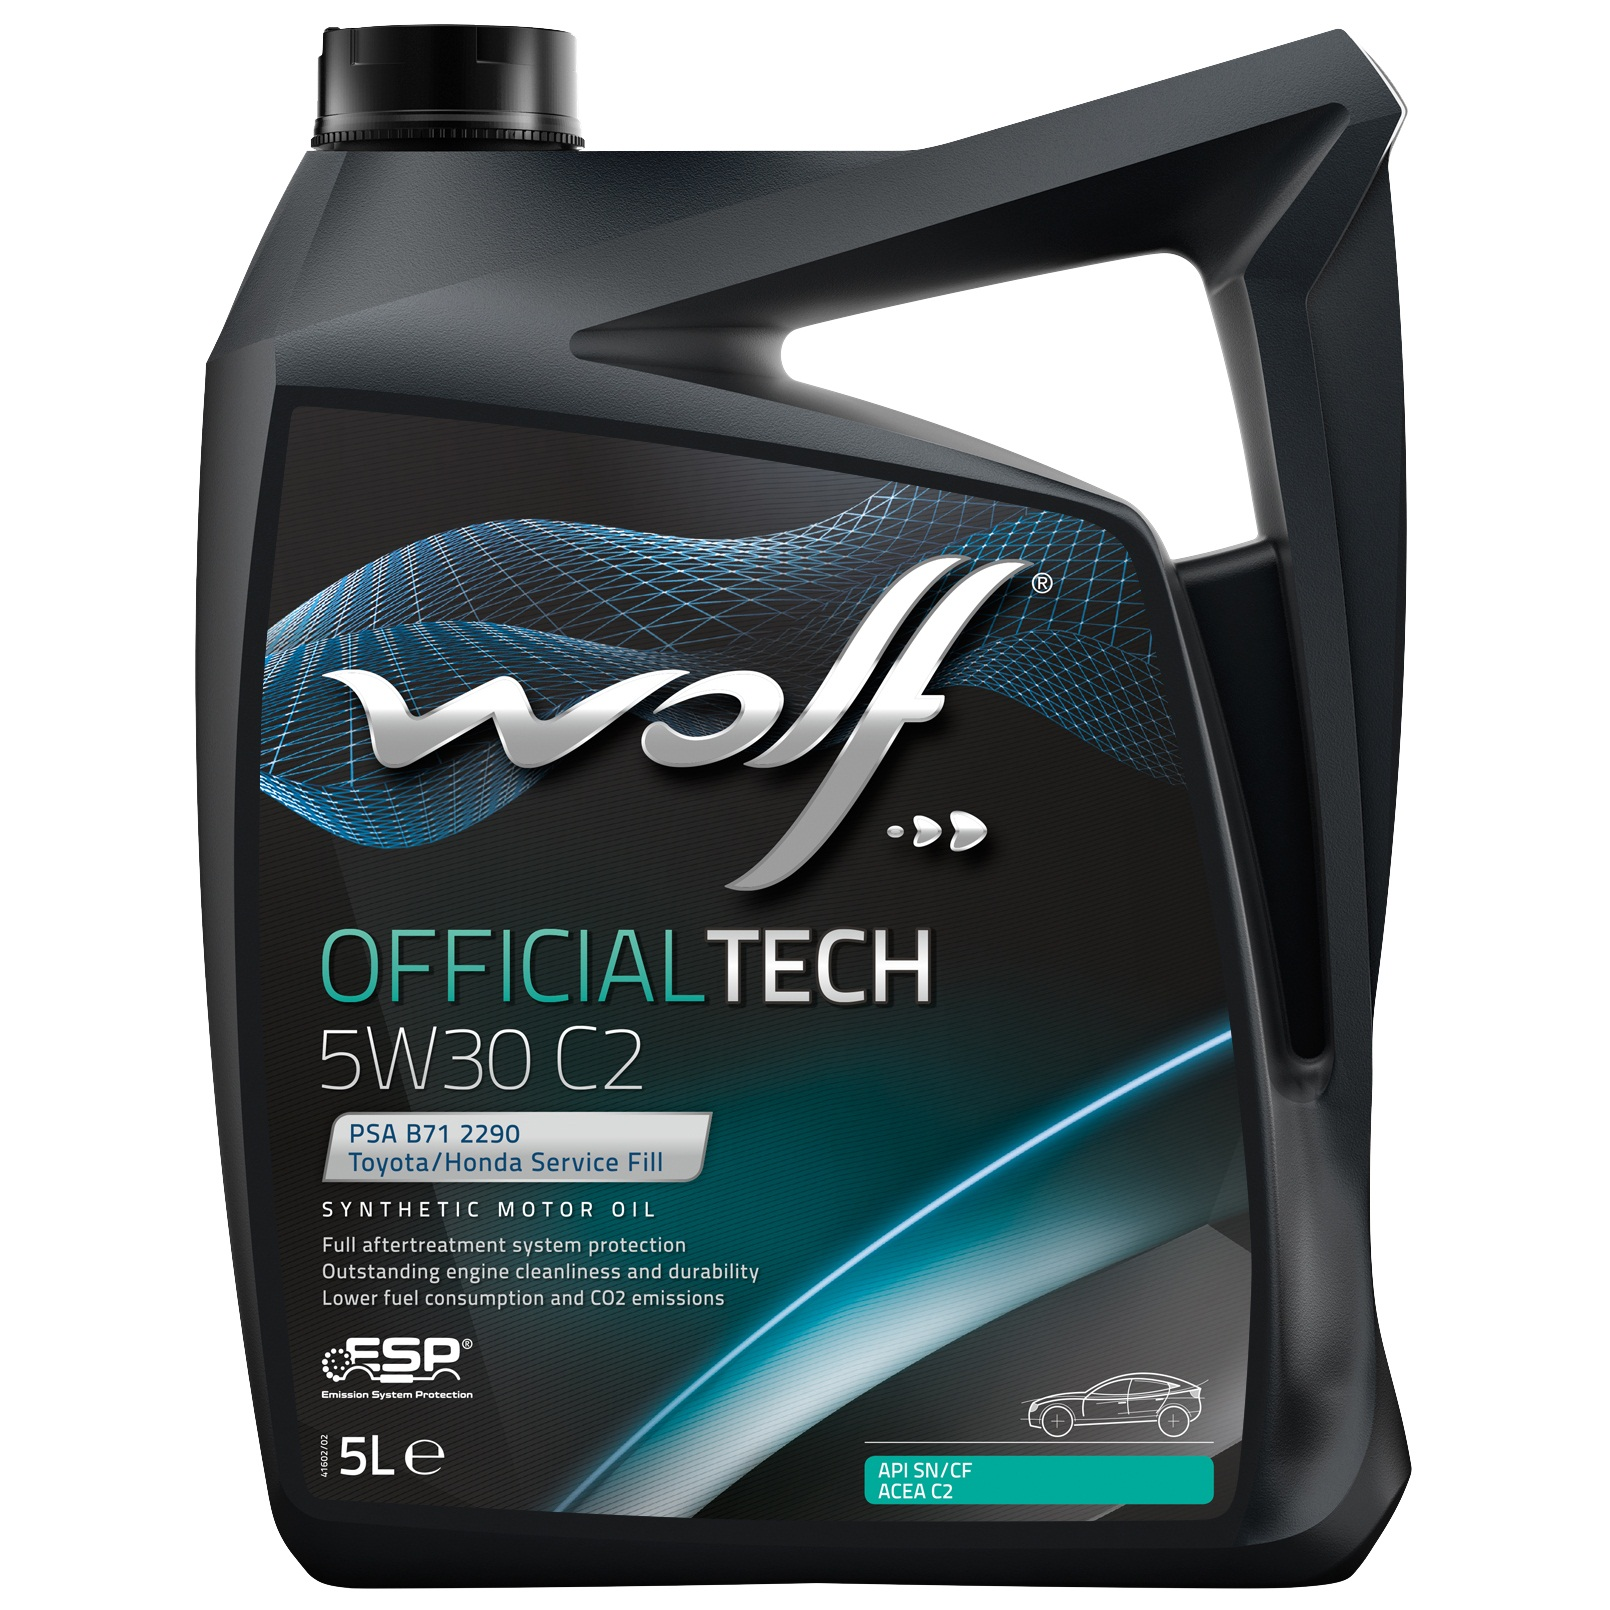 ULEI MOTOR WOLF OFFICIALTECH C2 5W30 5L